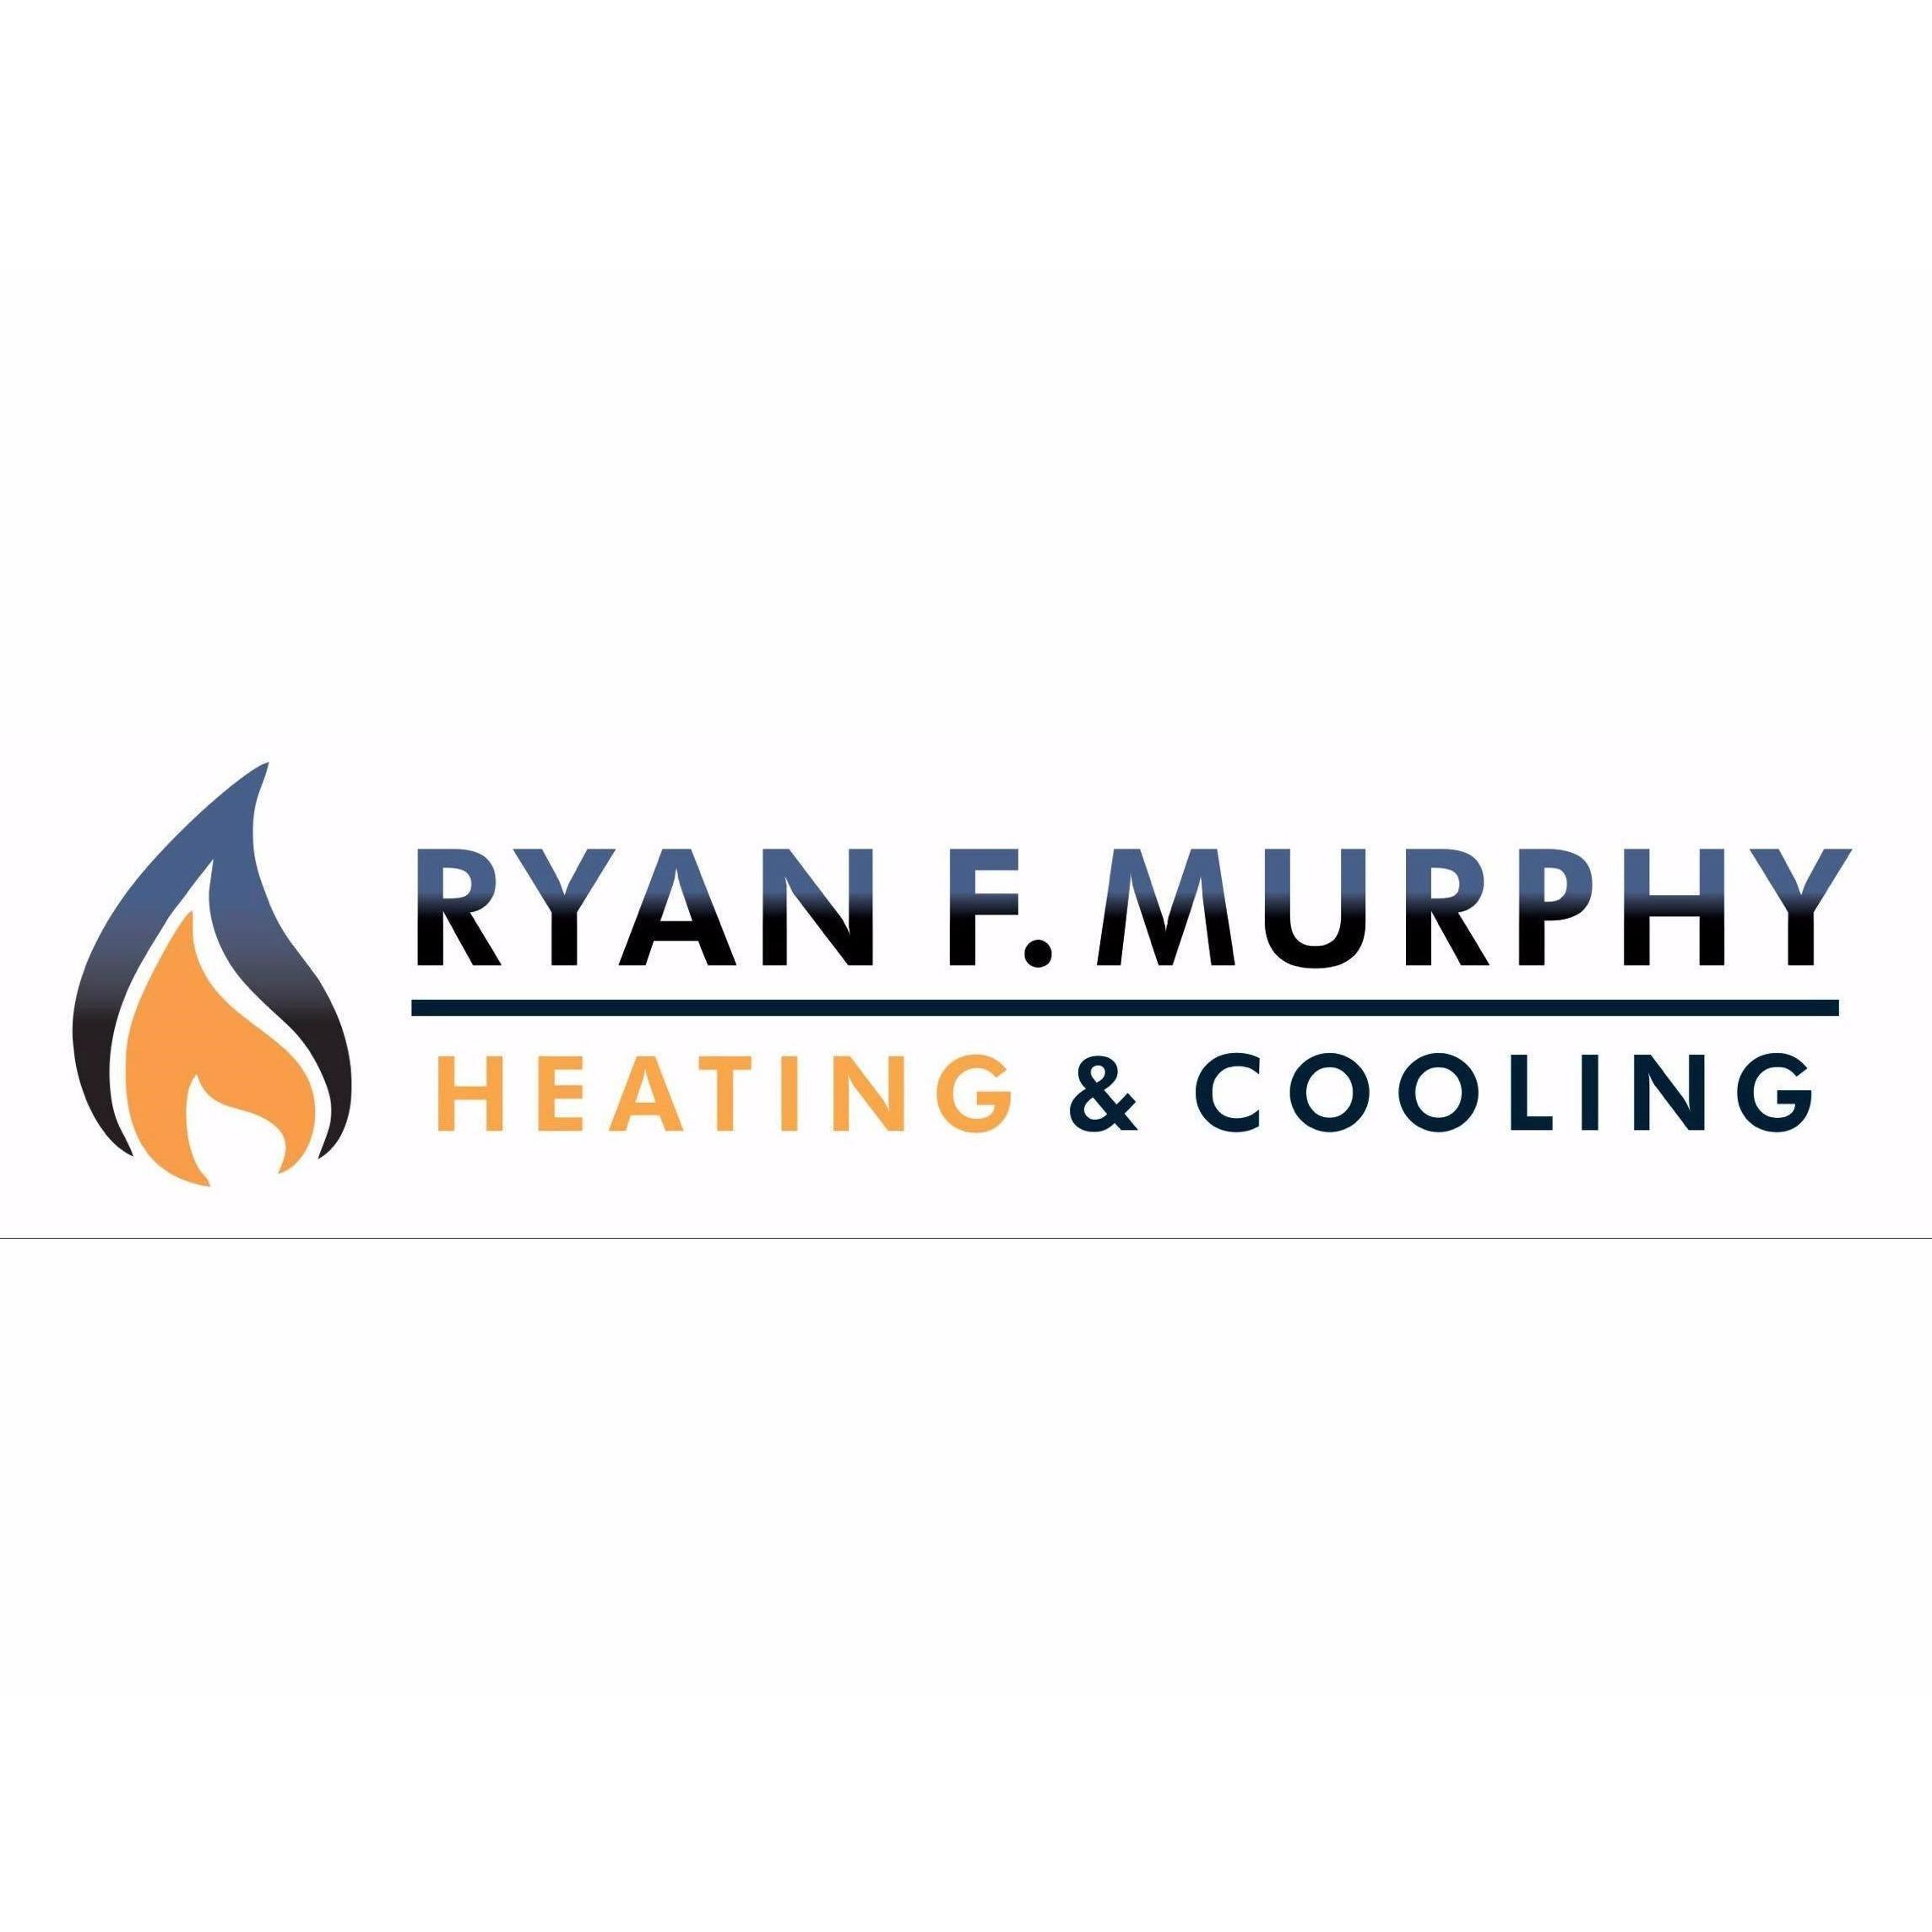 Ryan F. Murphy Heating & Cooling LLC